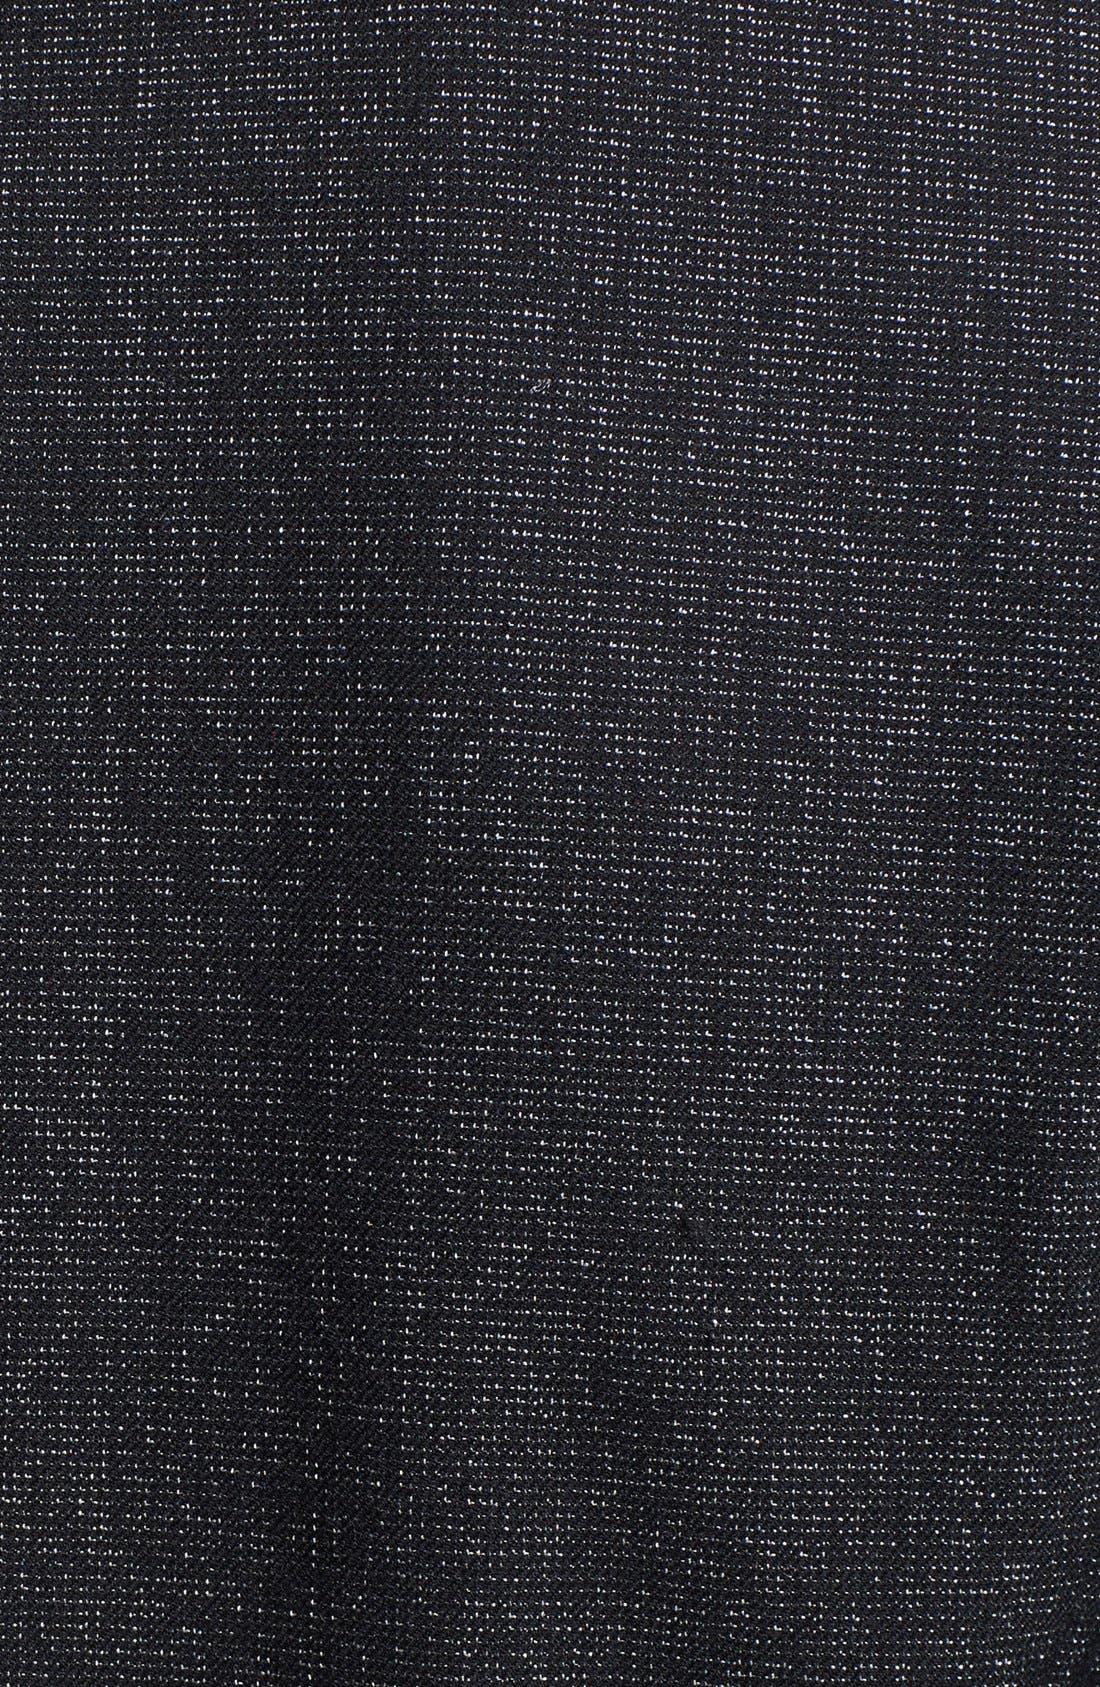 VINCE CAMUTO, Faux Leather Collar Peplum Blazer, Alternate thumbnail 5, color, 001